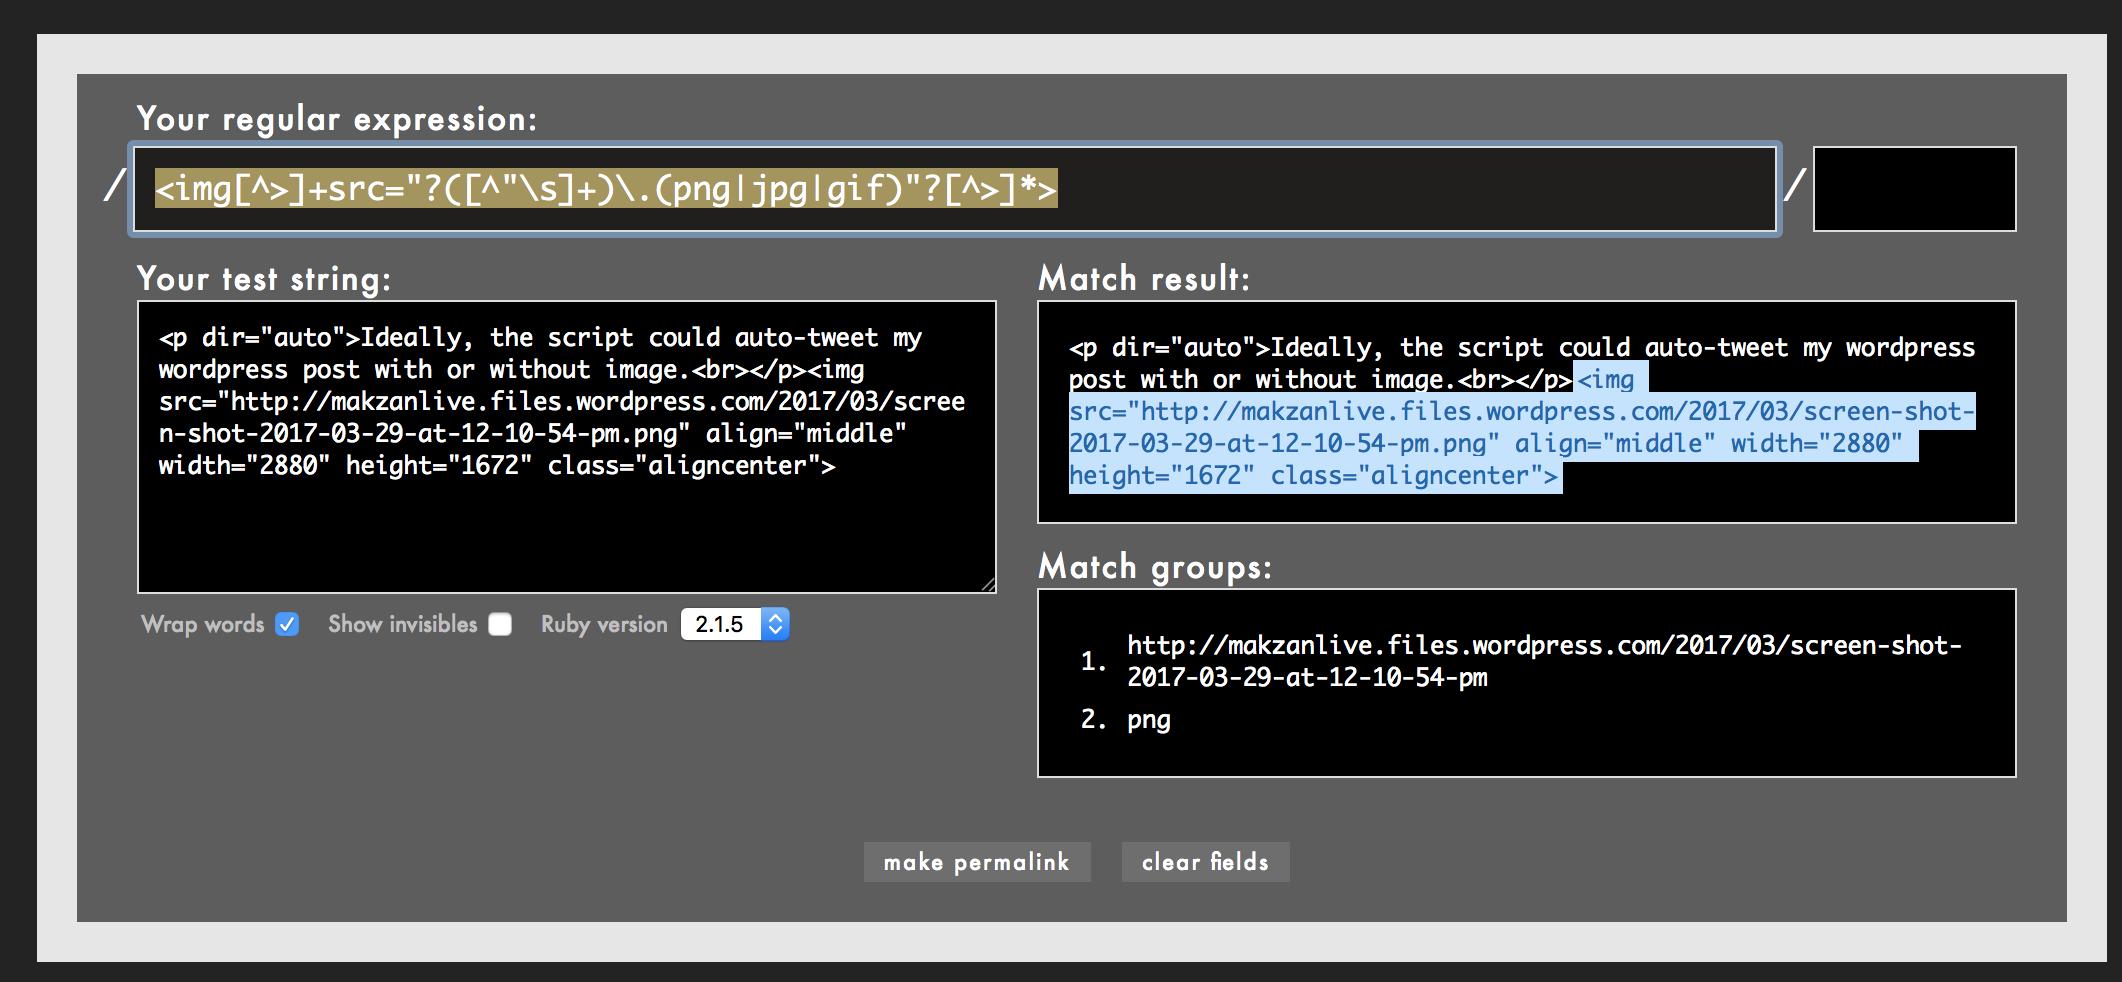 Testing Zapier with Imageagain